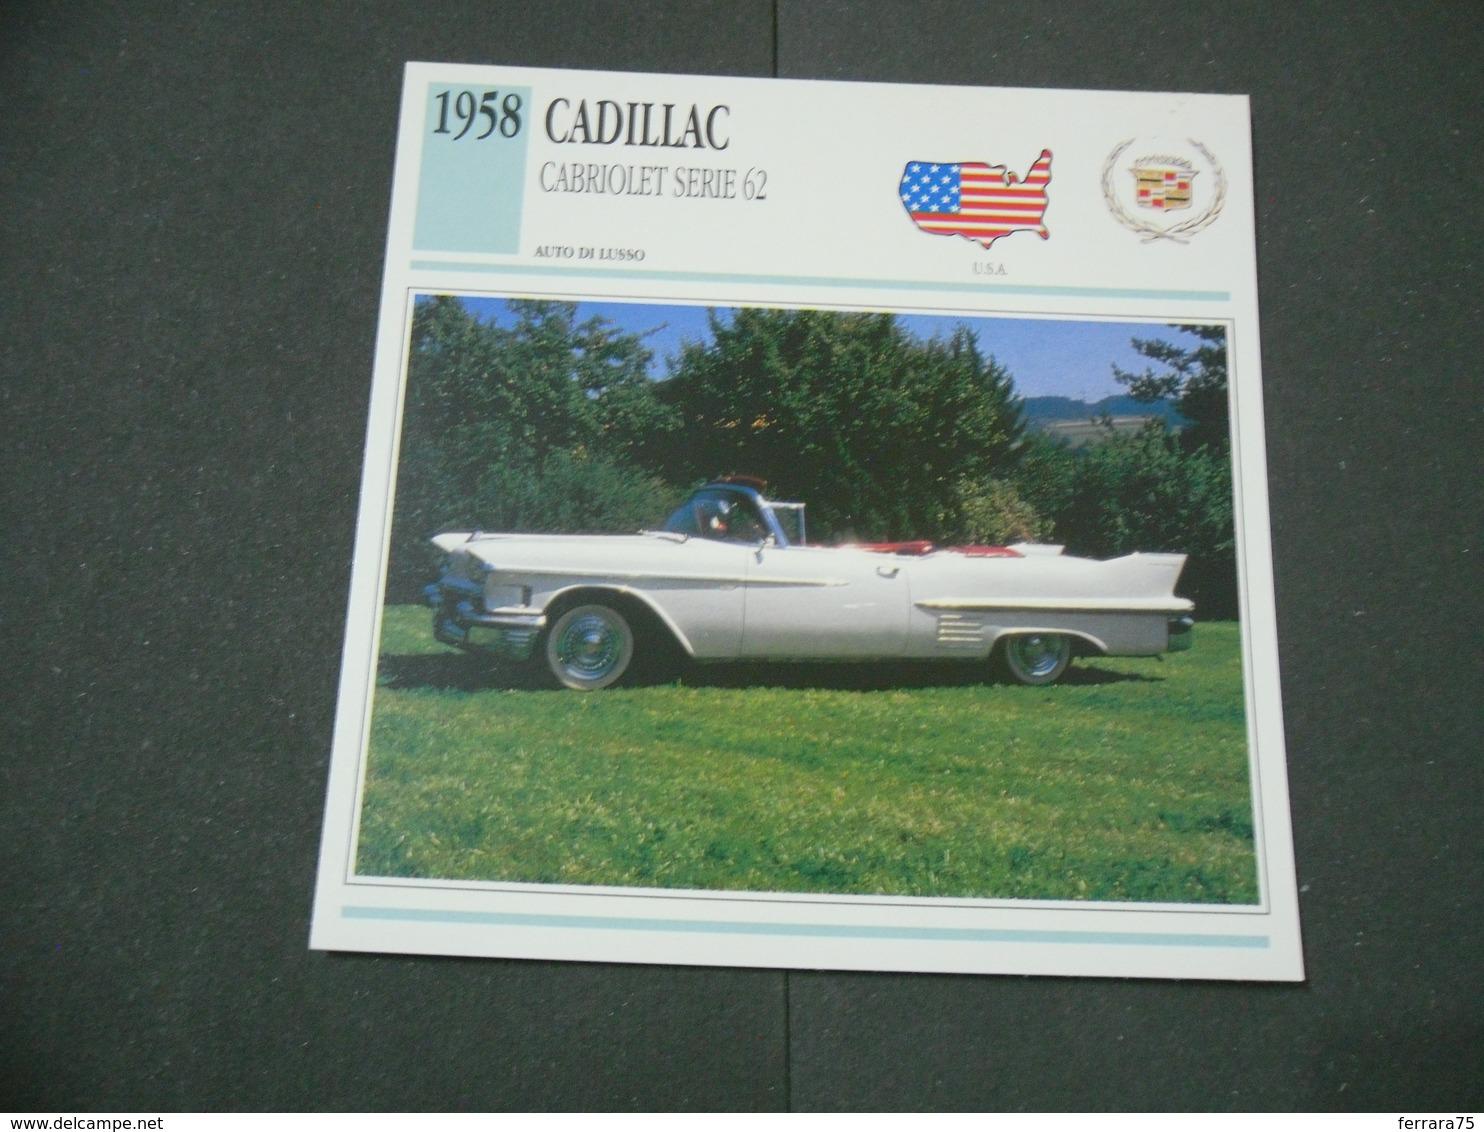 CARTOLINA CARD SCHEDA TECNICA  AUTO  CARS  CADILLAC CABRIOLET SERIE 62 - Altri